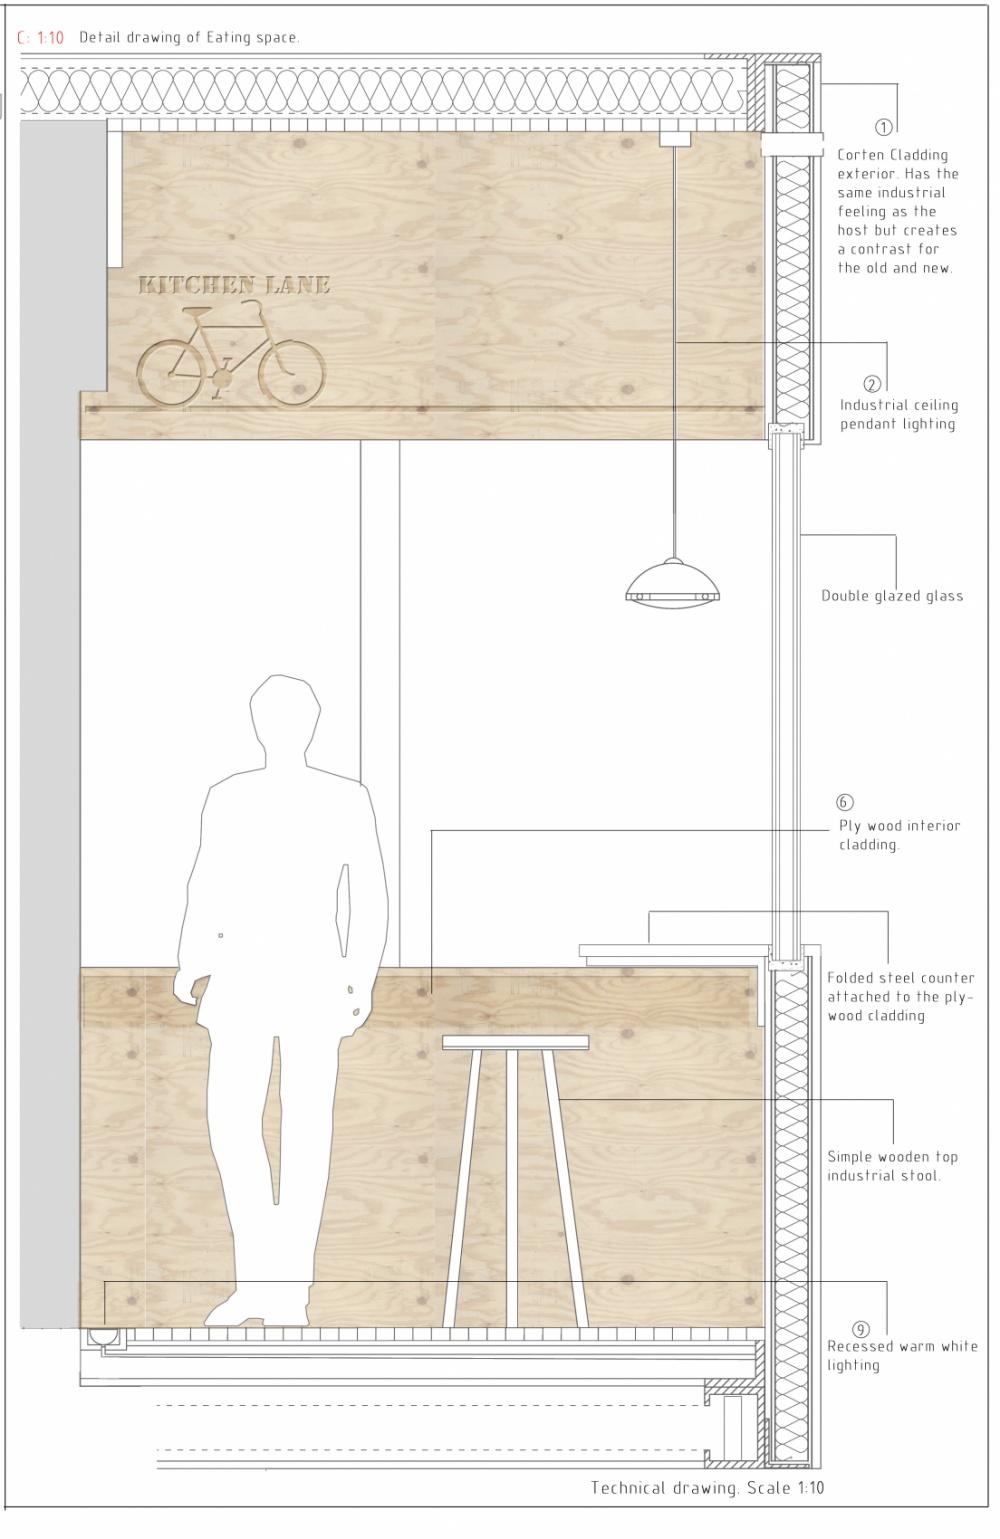 Marianne Khan Design - Detail interior section